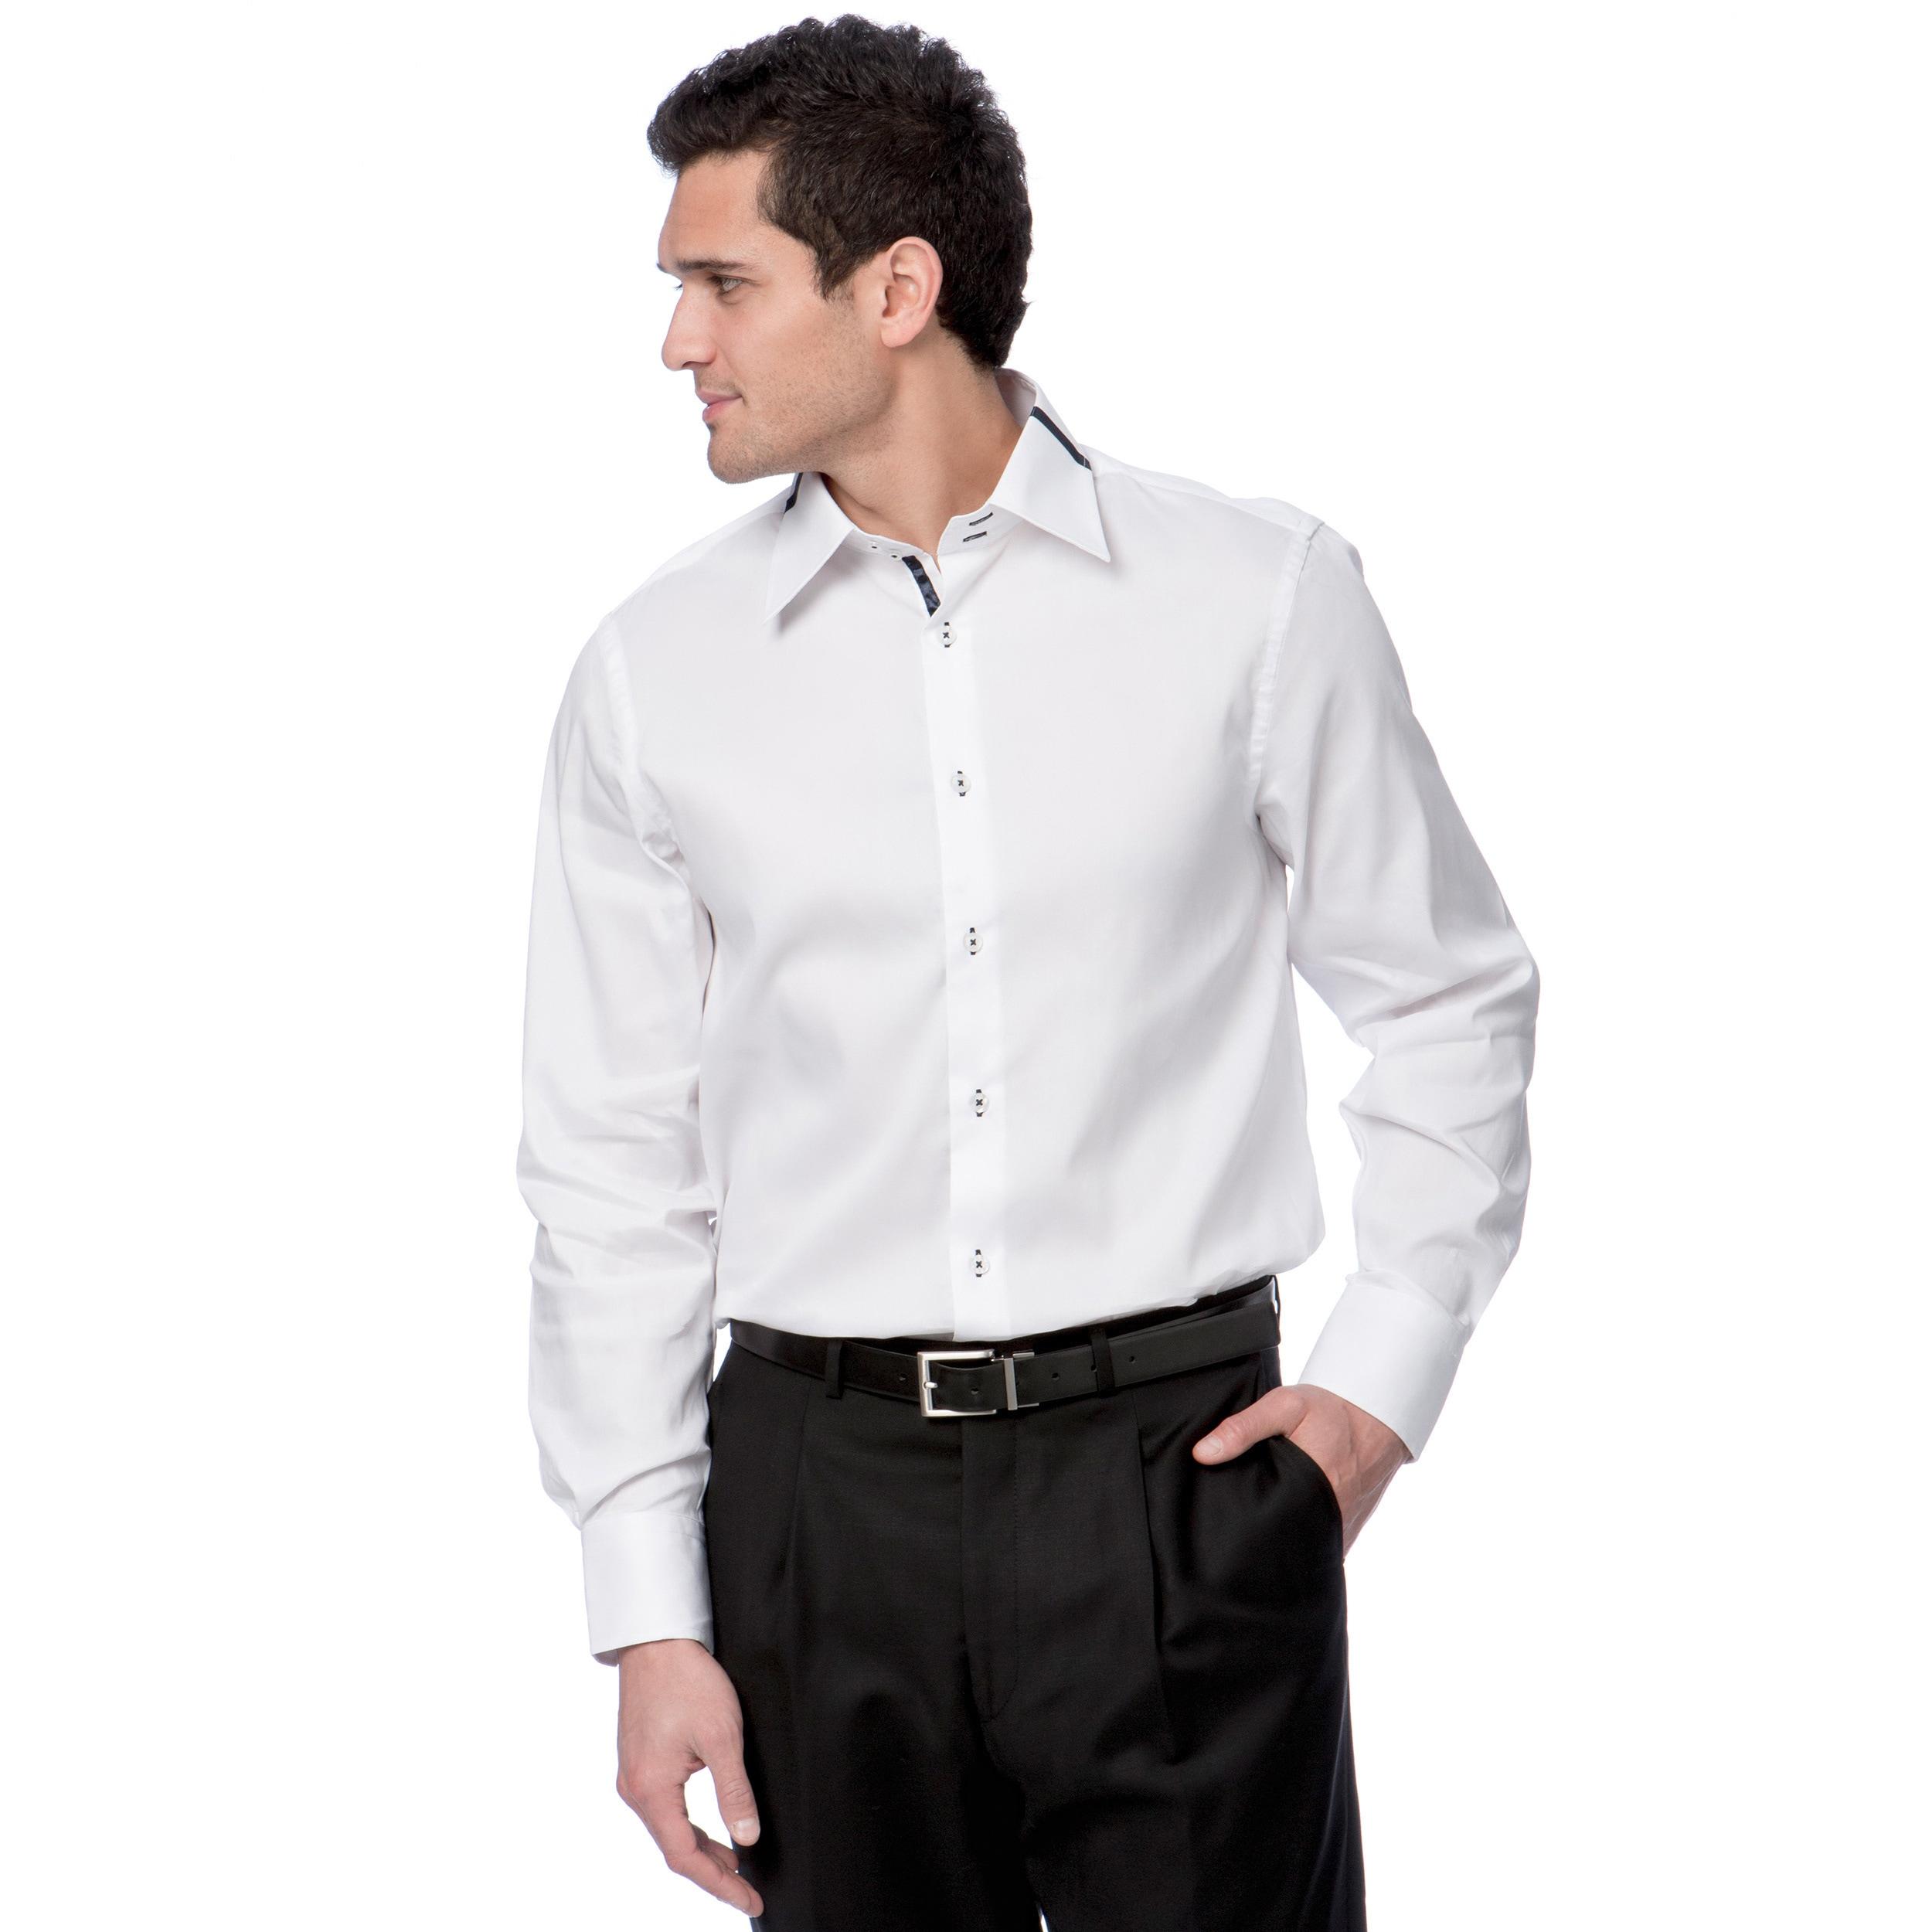 Brio milano men 39 s white and navy button down dress shirt for White button down dress shirt